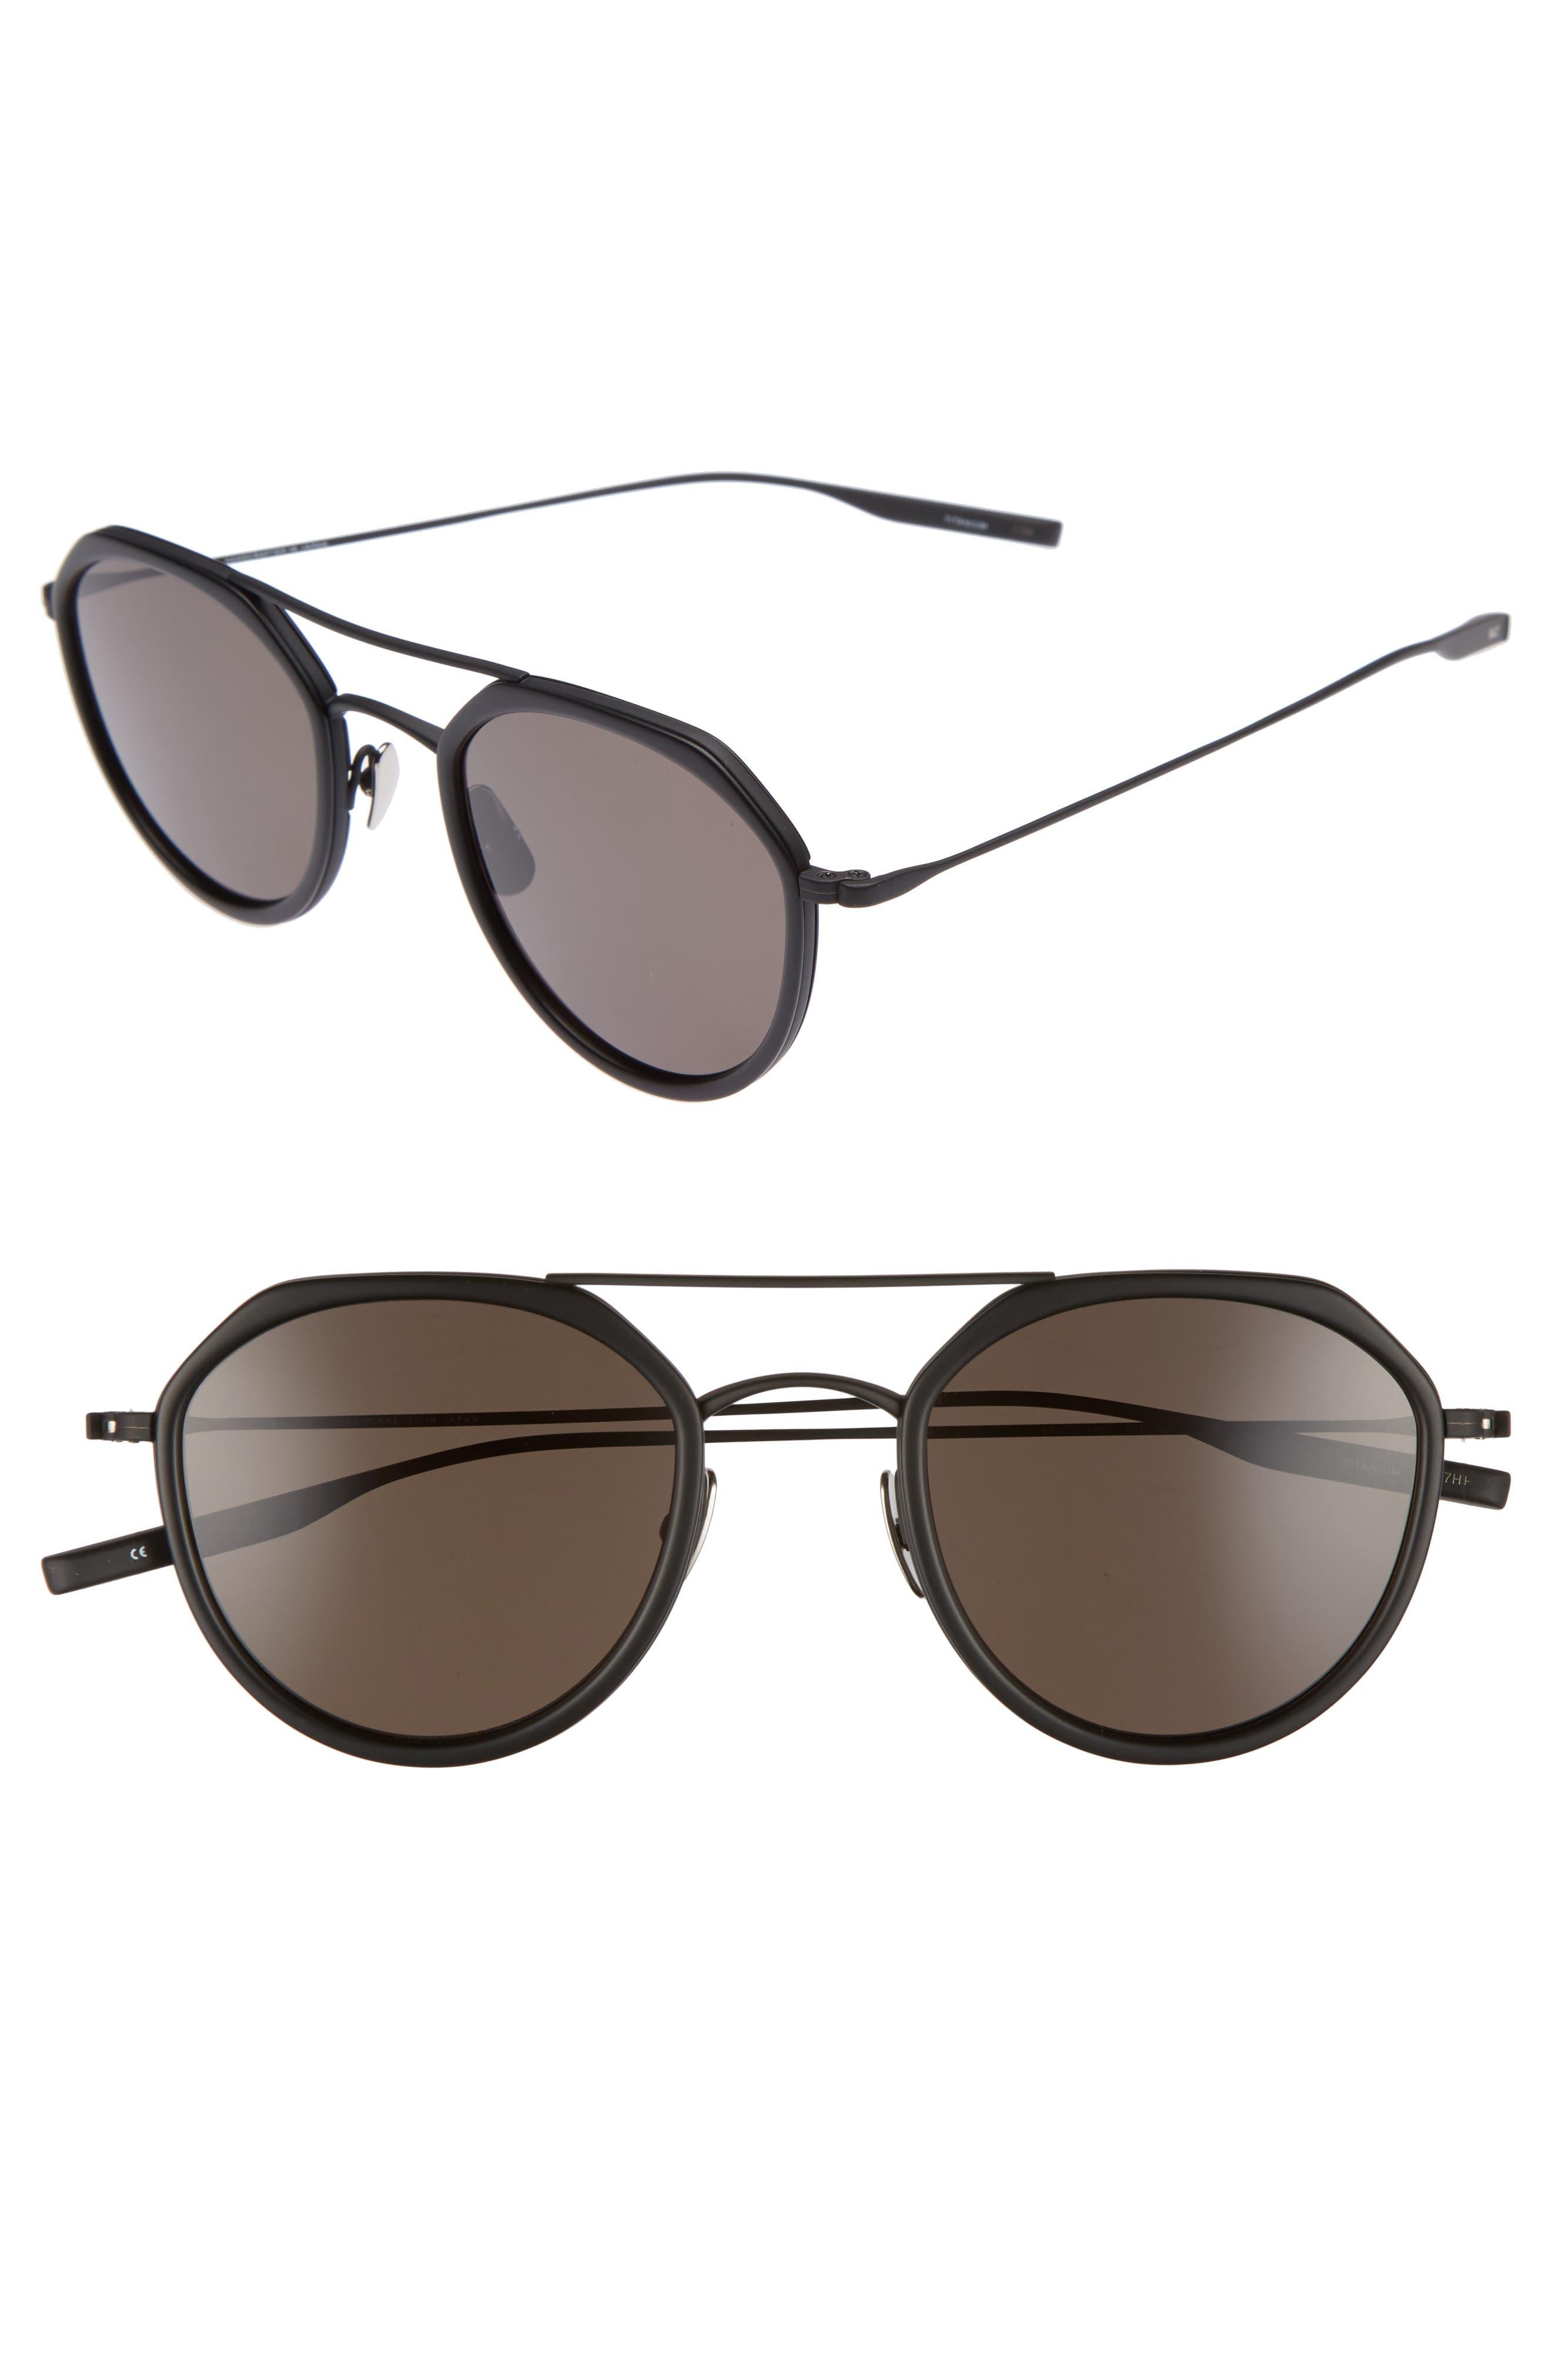 Main Image - Salt 50mm Polarized Round Sunglasses